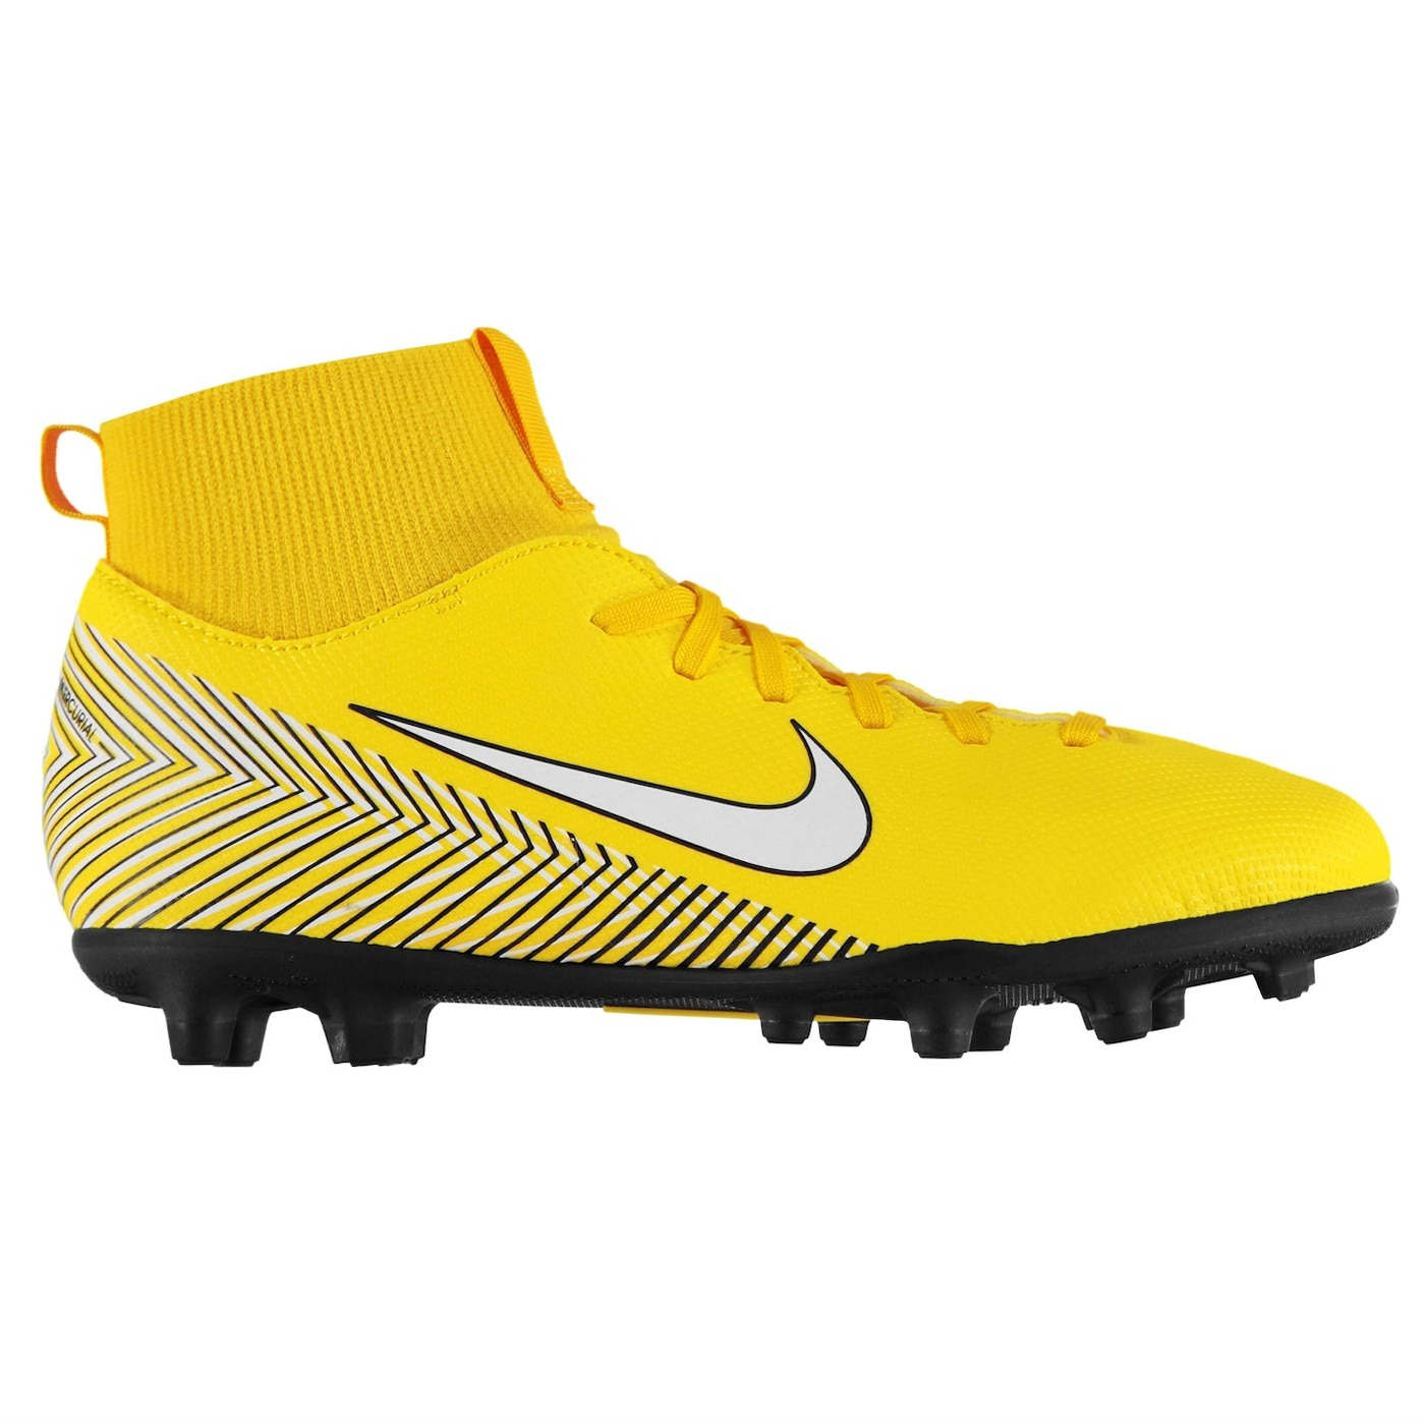 Nike Mercurial Superfly Club Neymar Jr DF Junior FG Football Boots